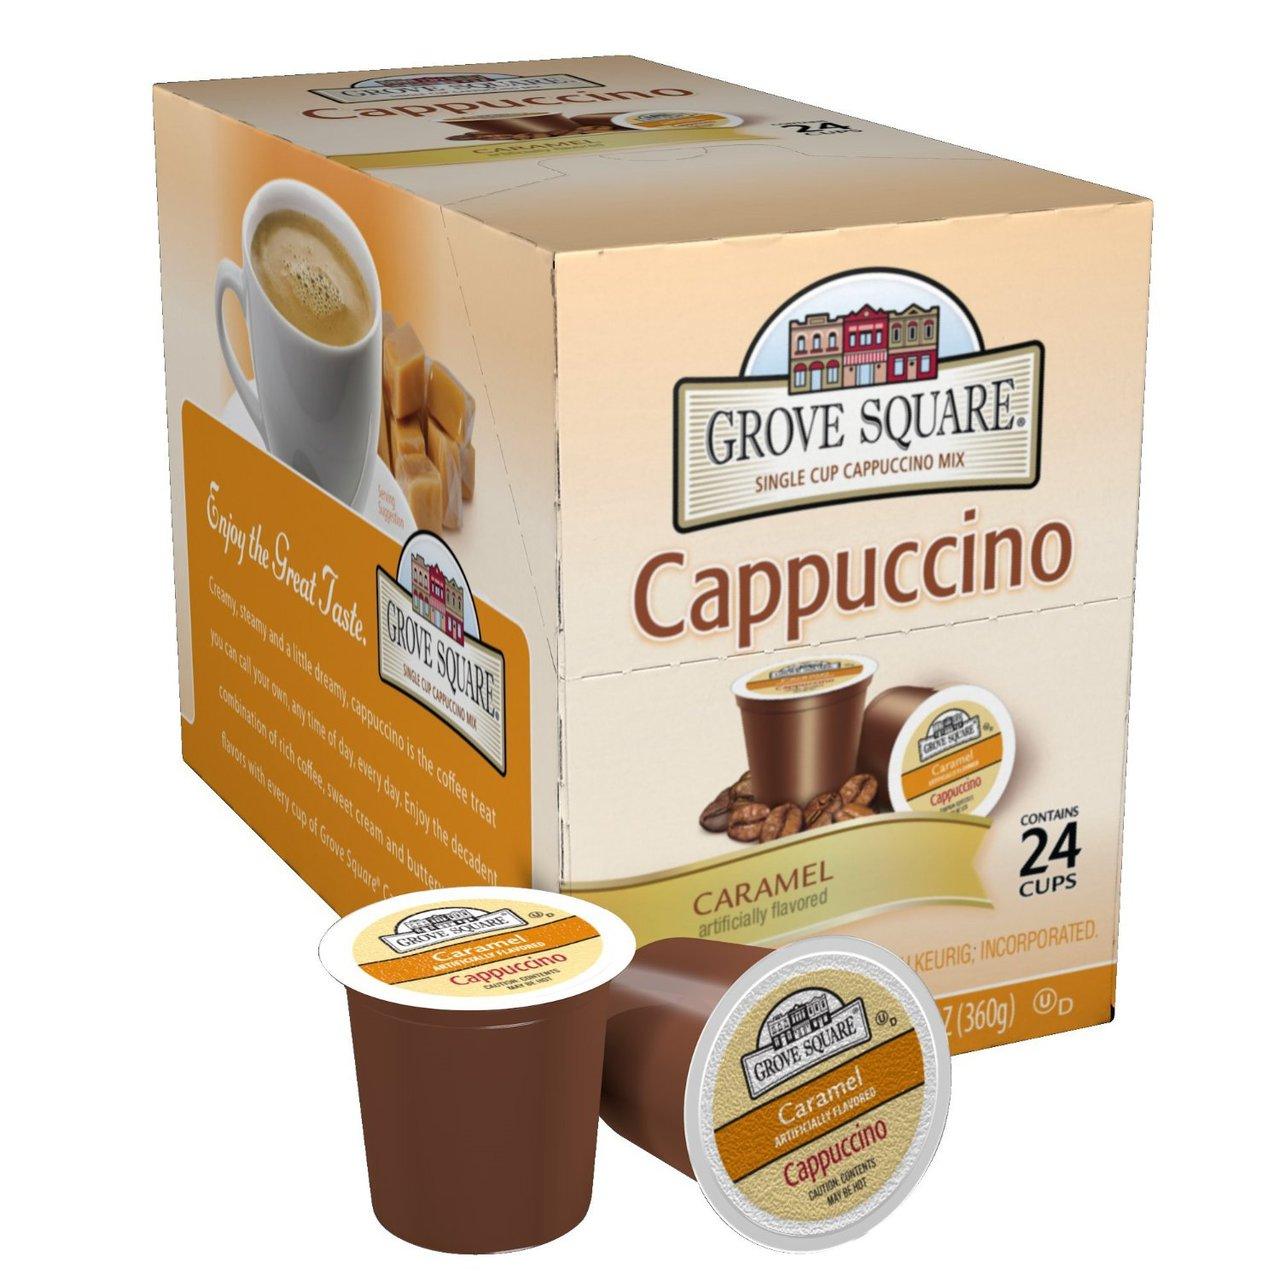 4 PACKS : Grove Square Cappuccino, Caramel, 24 Single Serve Cups